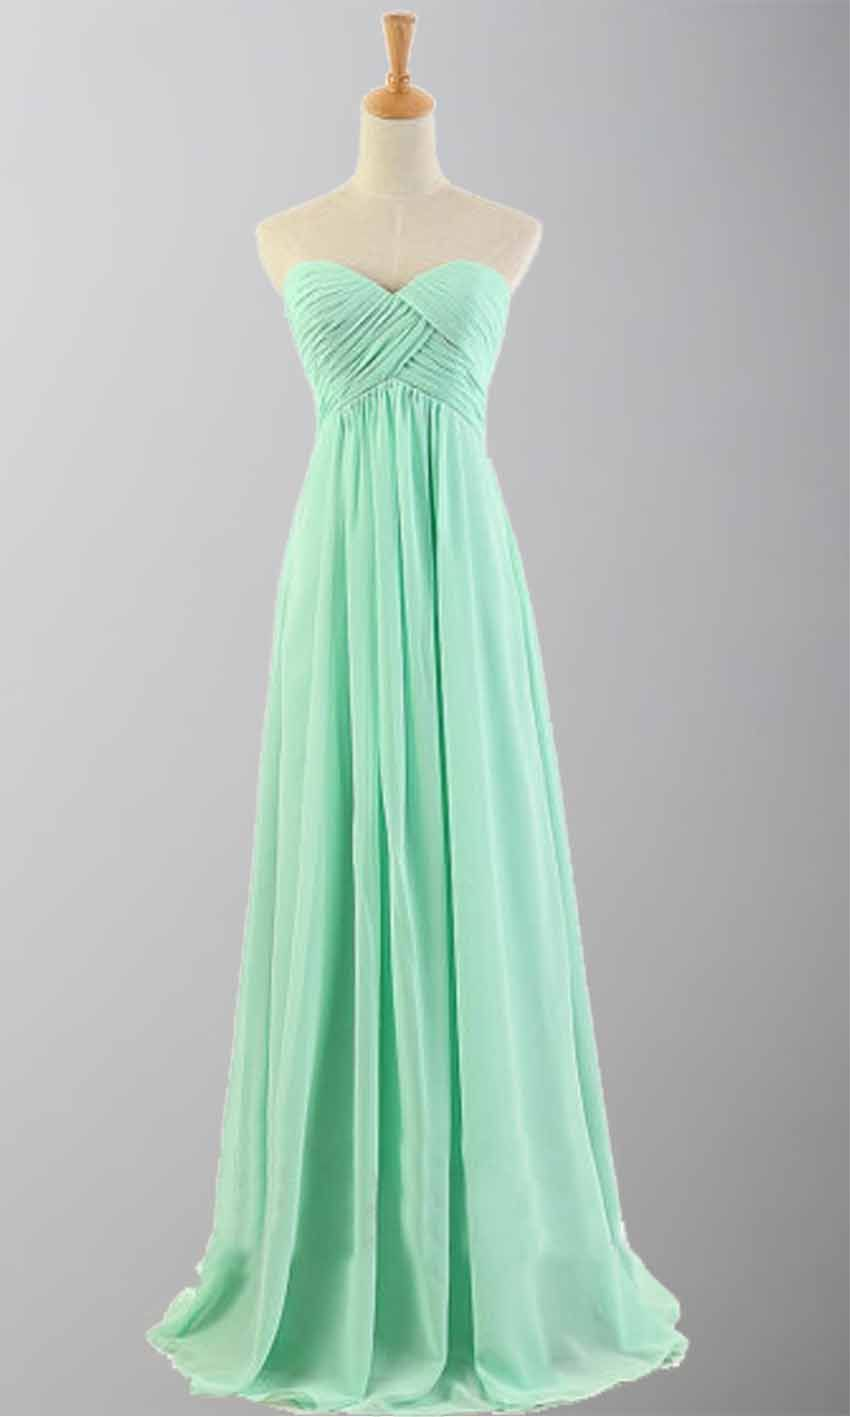 Mint green cross pleated long bridesmaid dresses ksp171 prom mint green cross pleated long bridesmaid dresses ksp171 ombrellifo Images